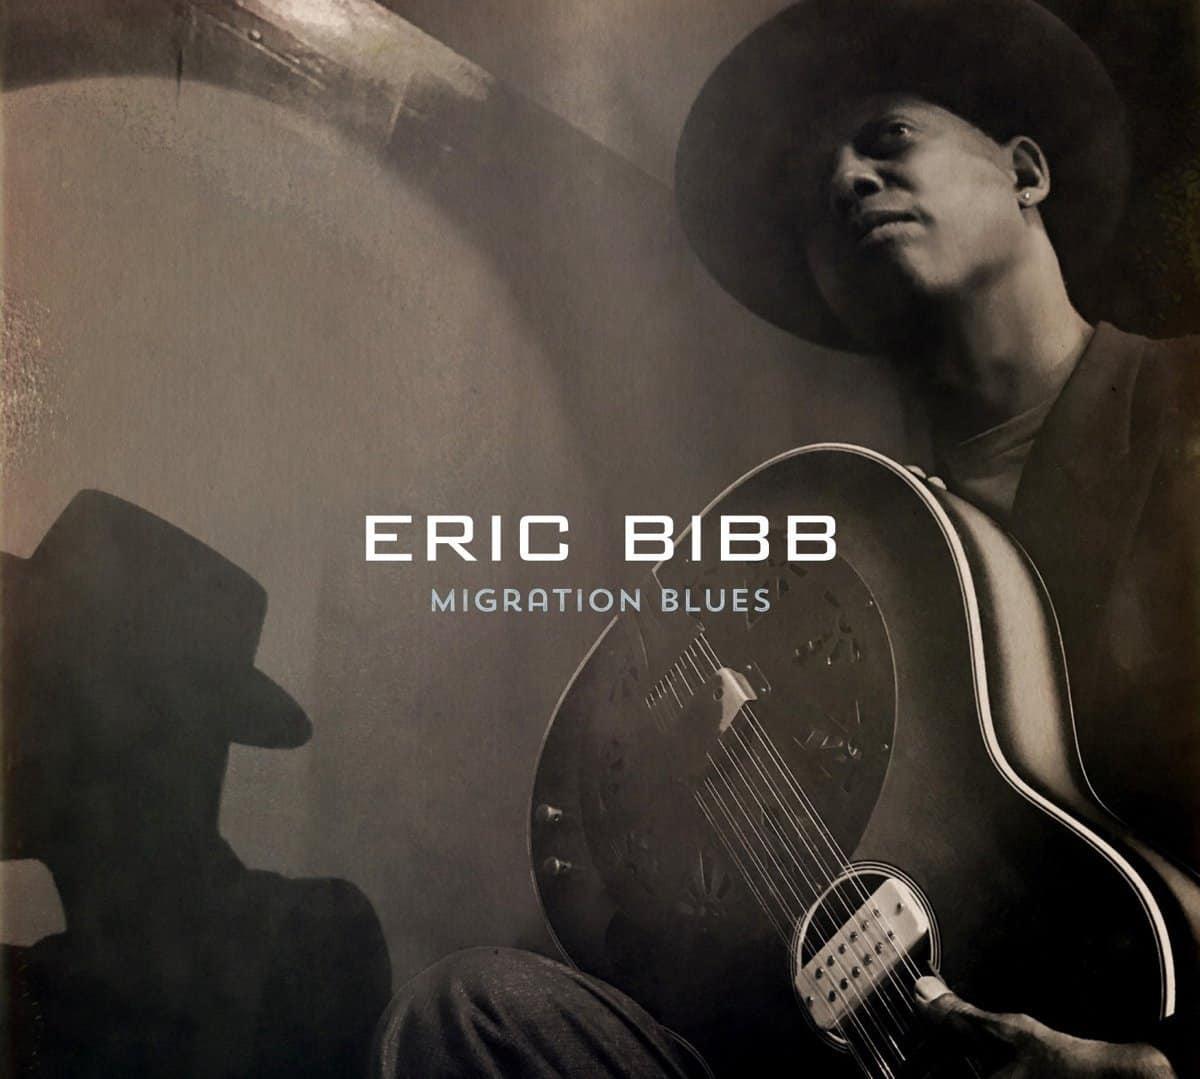 eric bibb Migration Blues